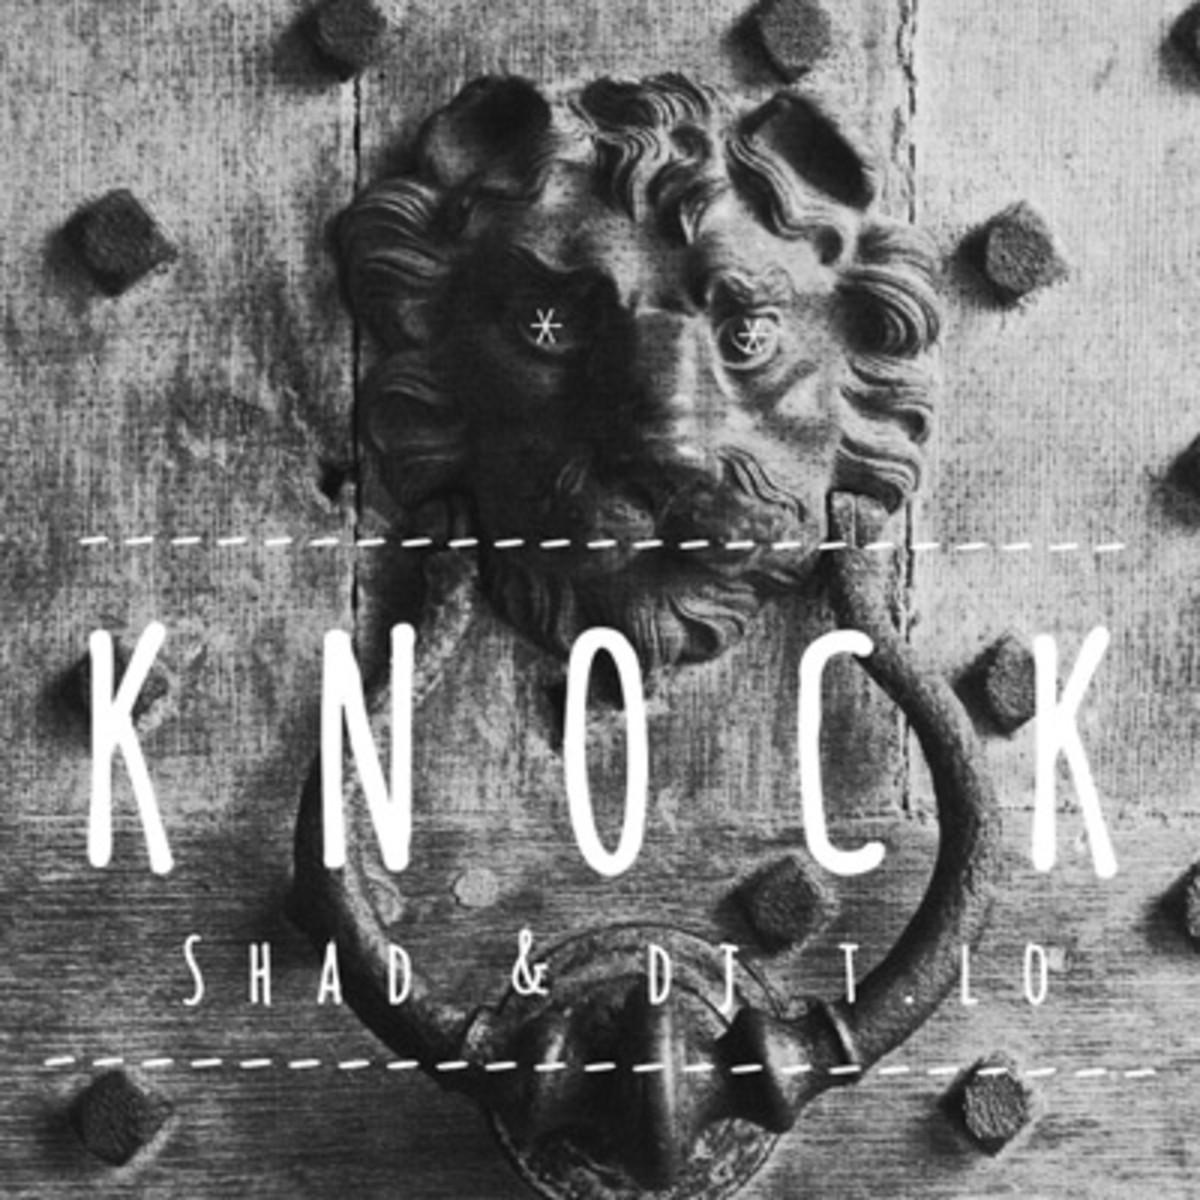 shad-knock.jpg